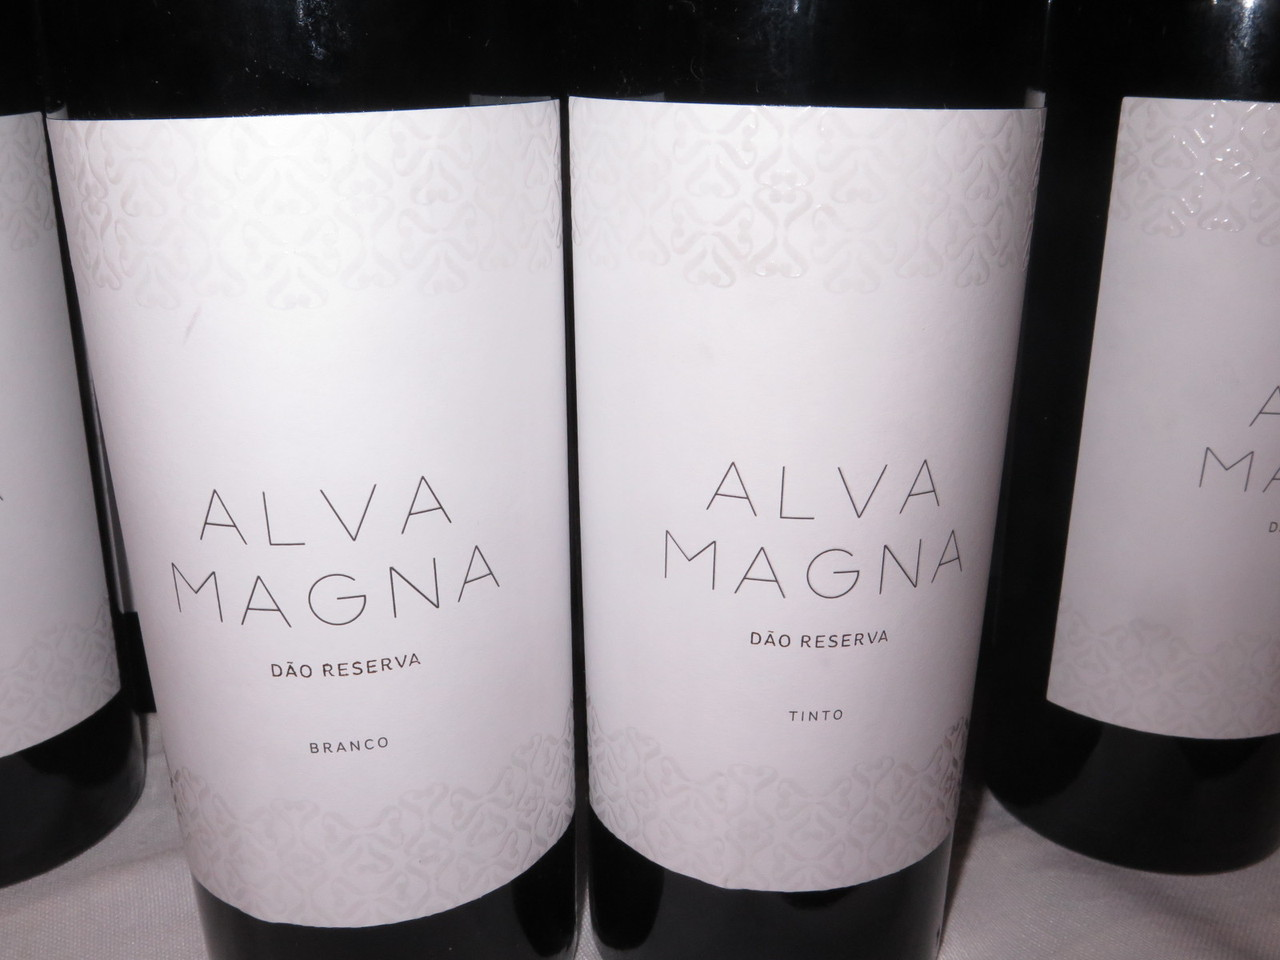 Alva Magna branco 2016 e Alva Magna tinto 2015